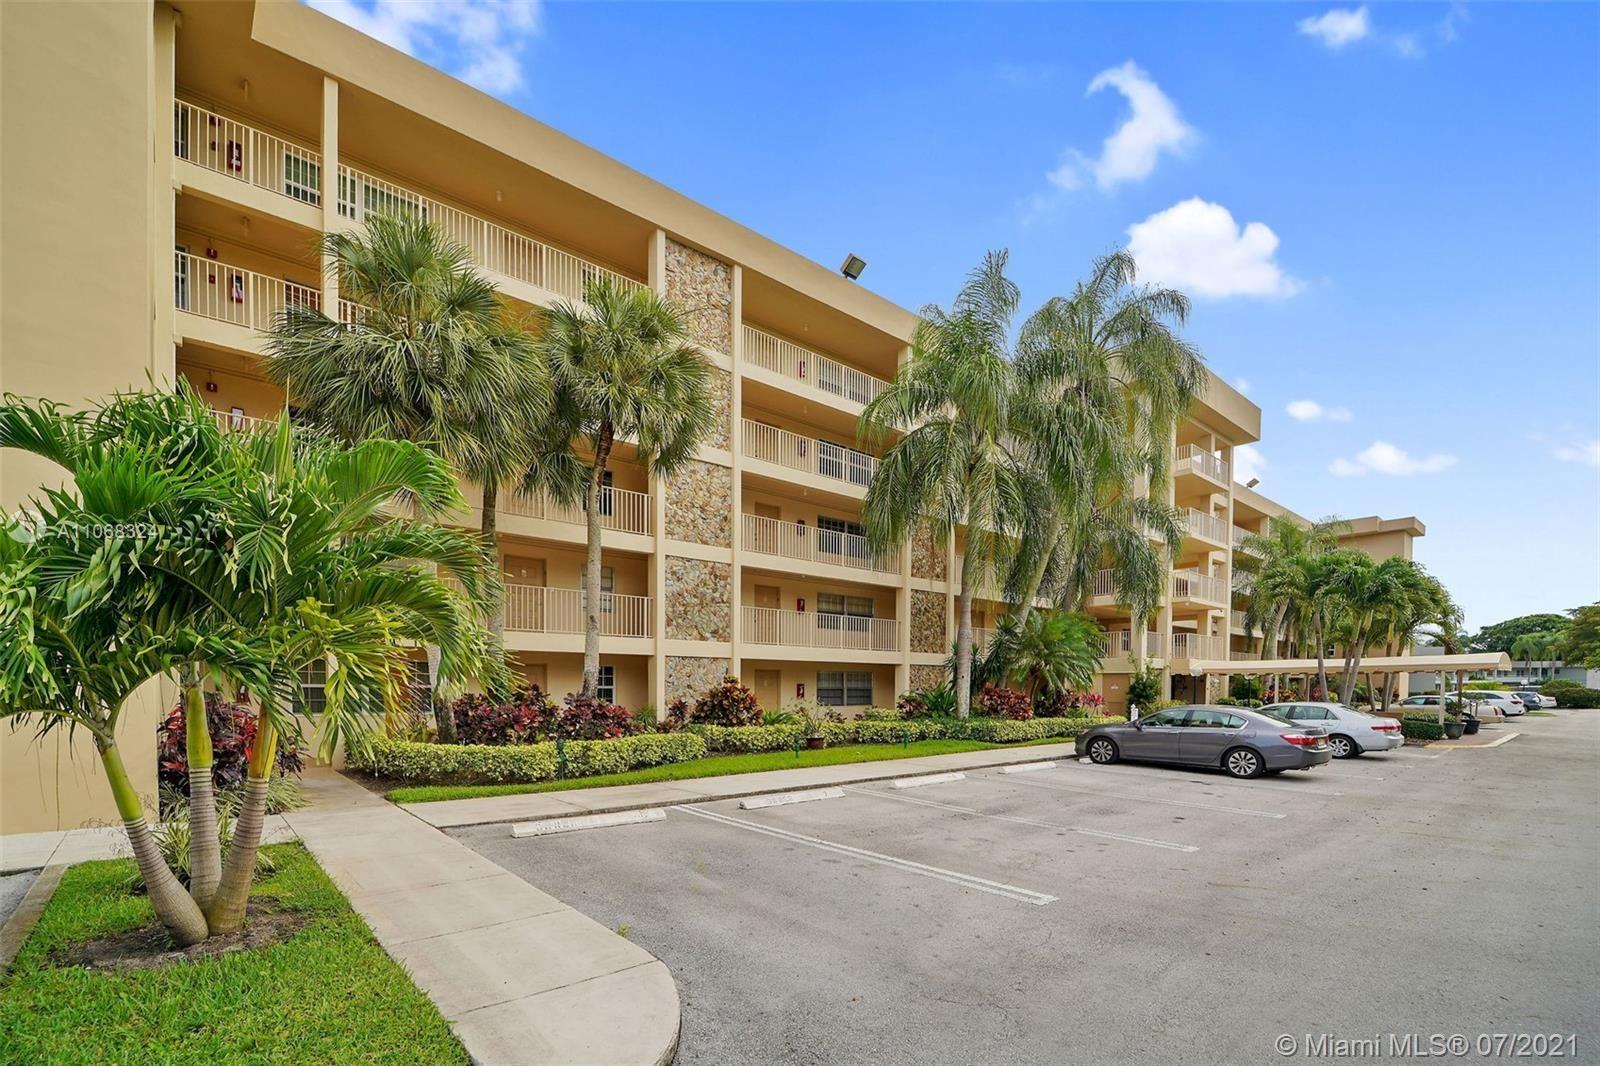 4030 W Palm Aire Dr #307, Pompano Beach, FL 33069 - #: A11068324